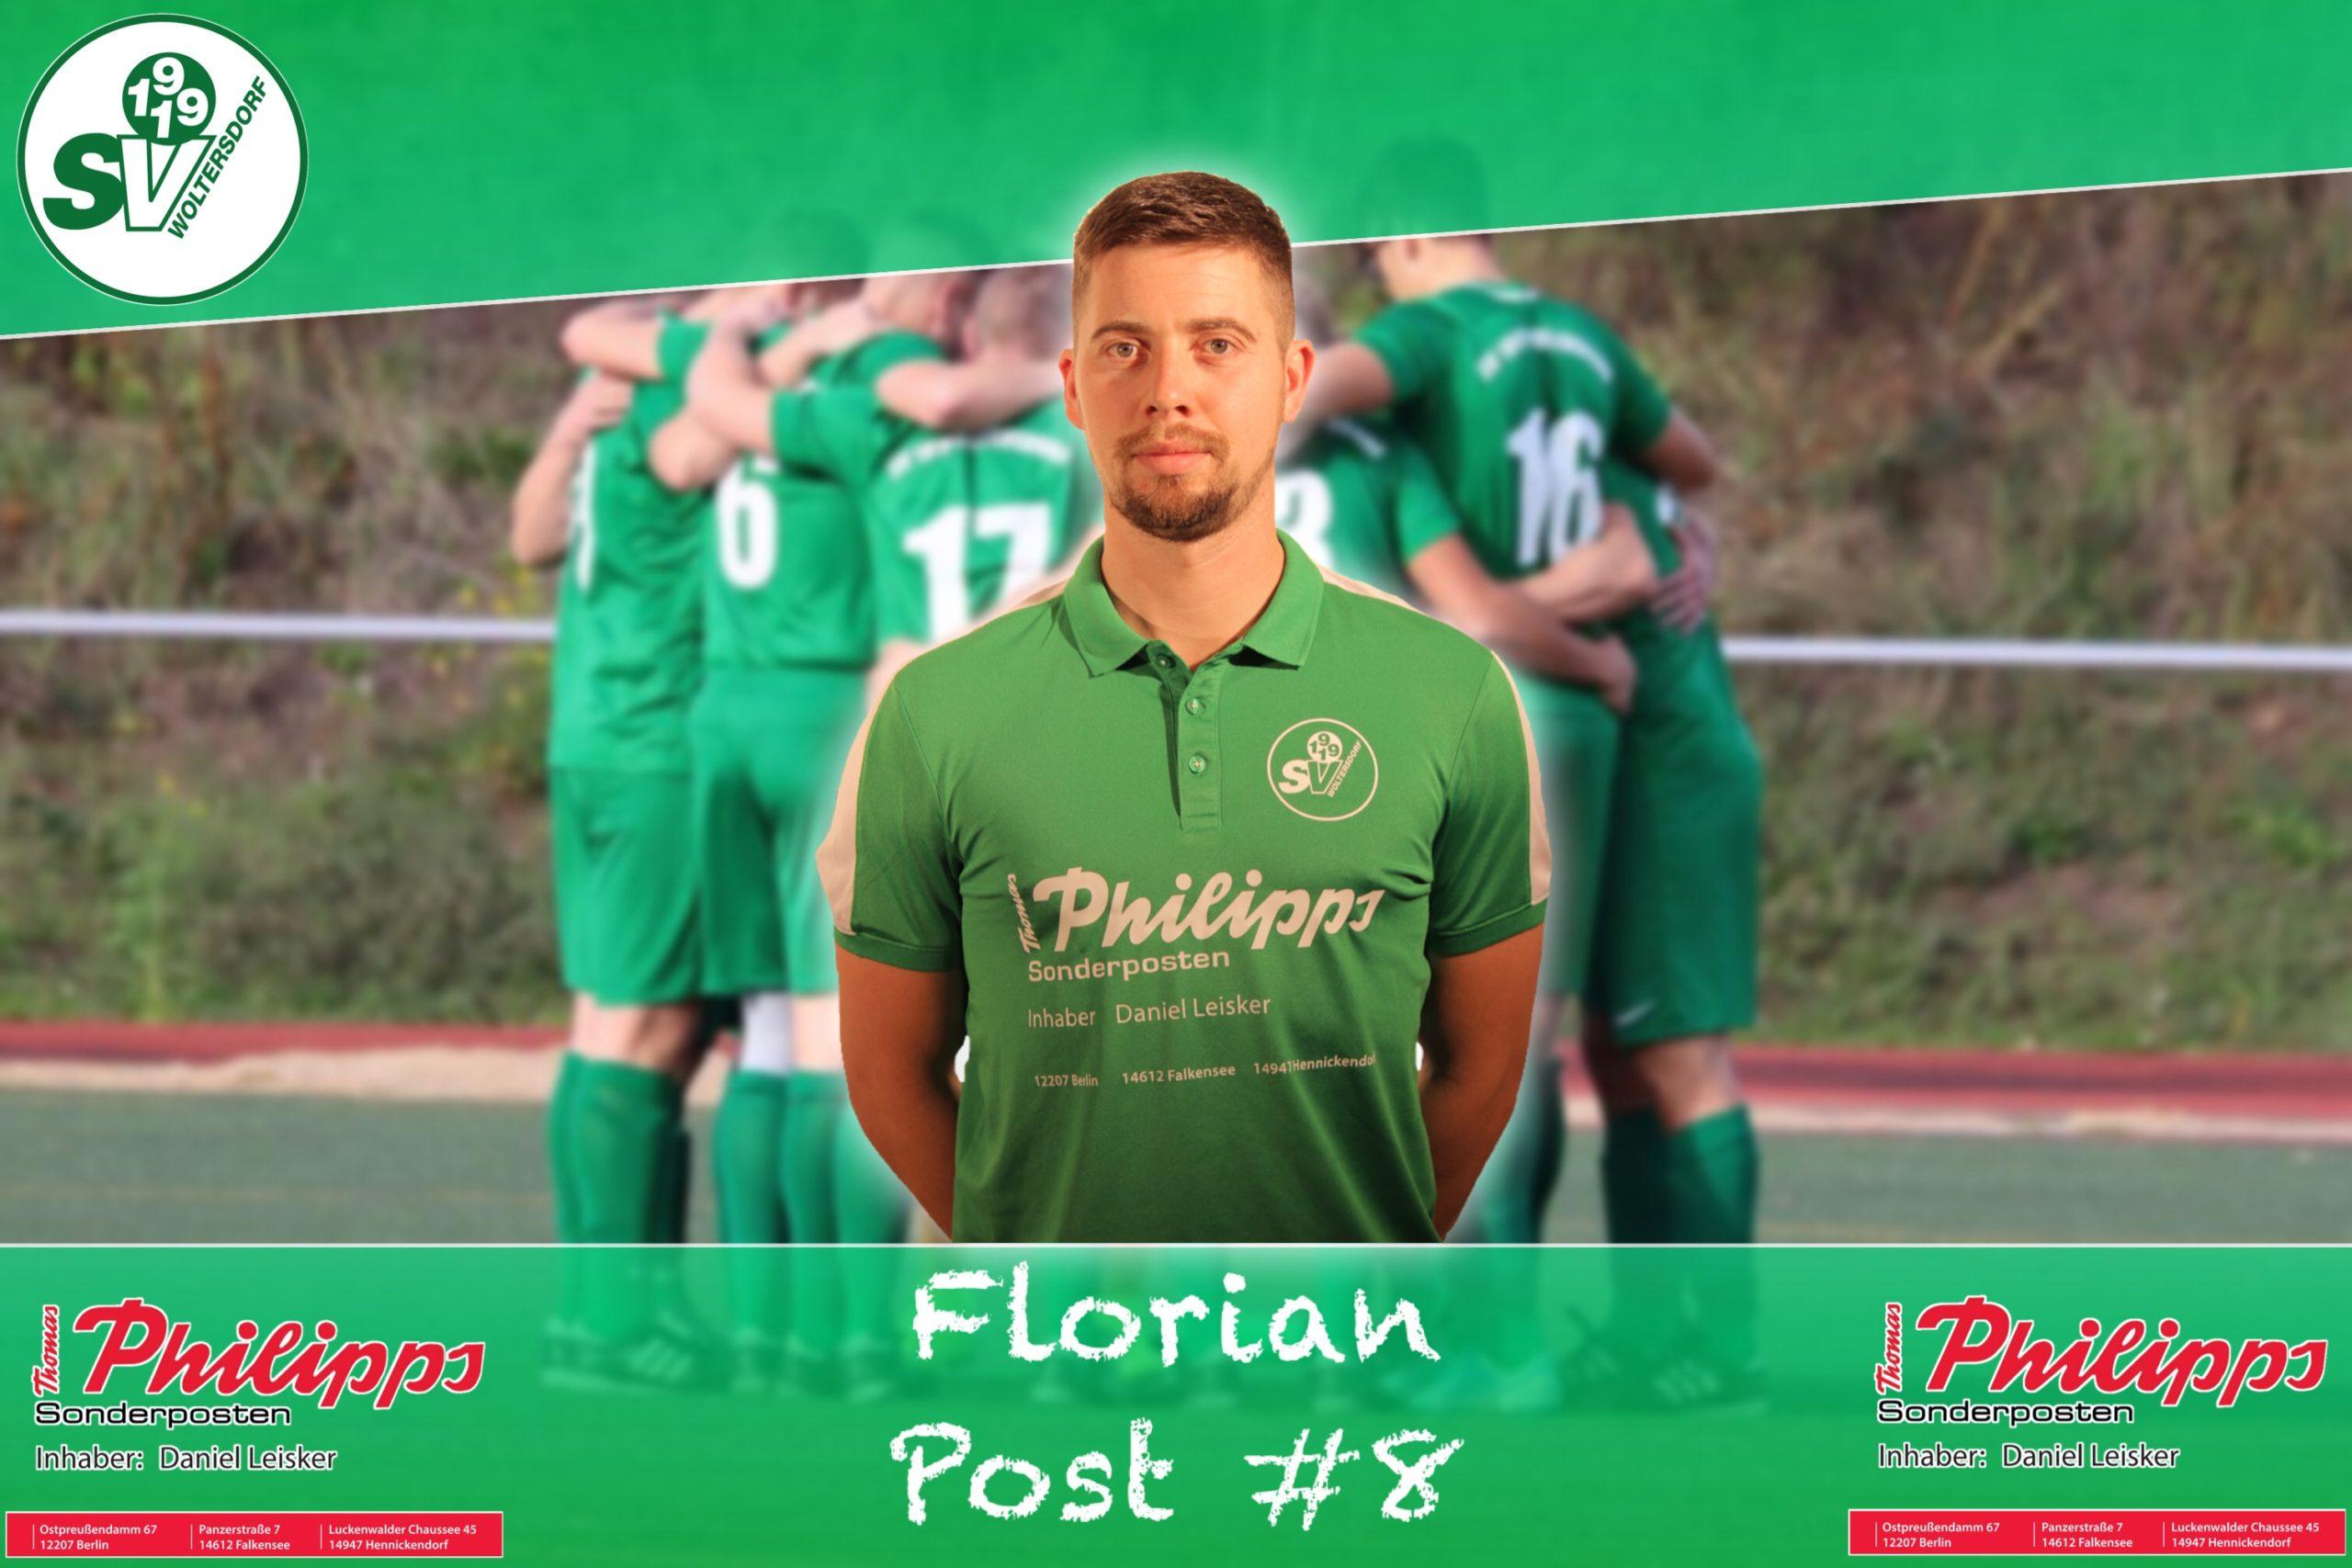 Florian Post